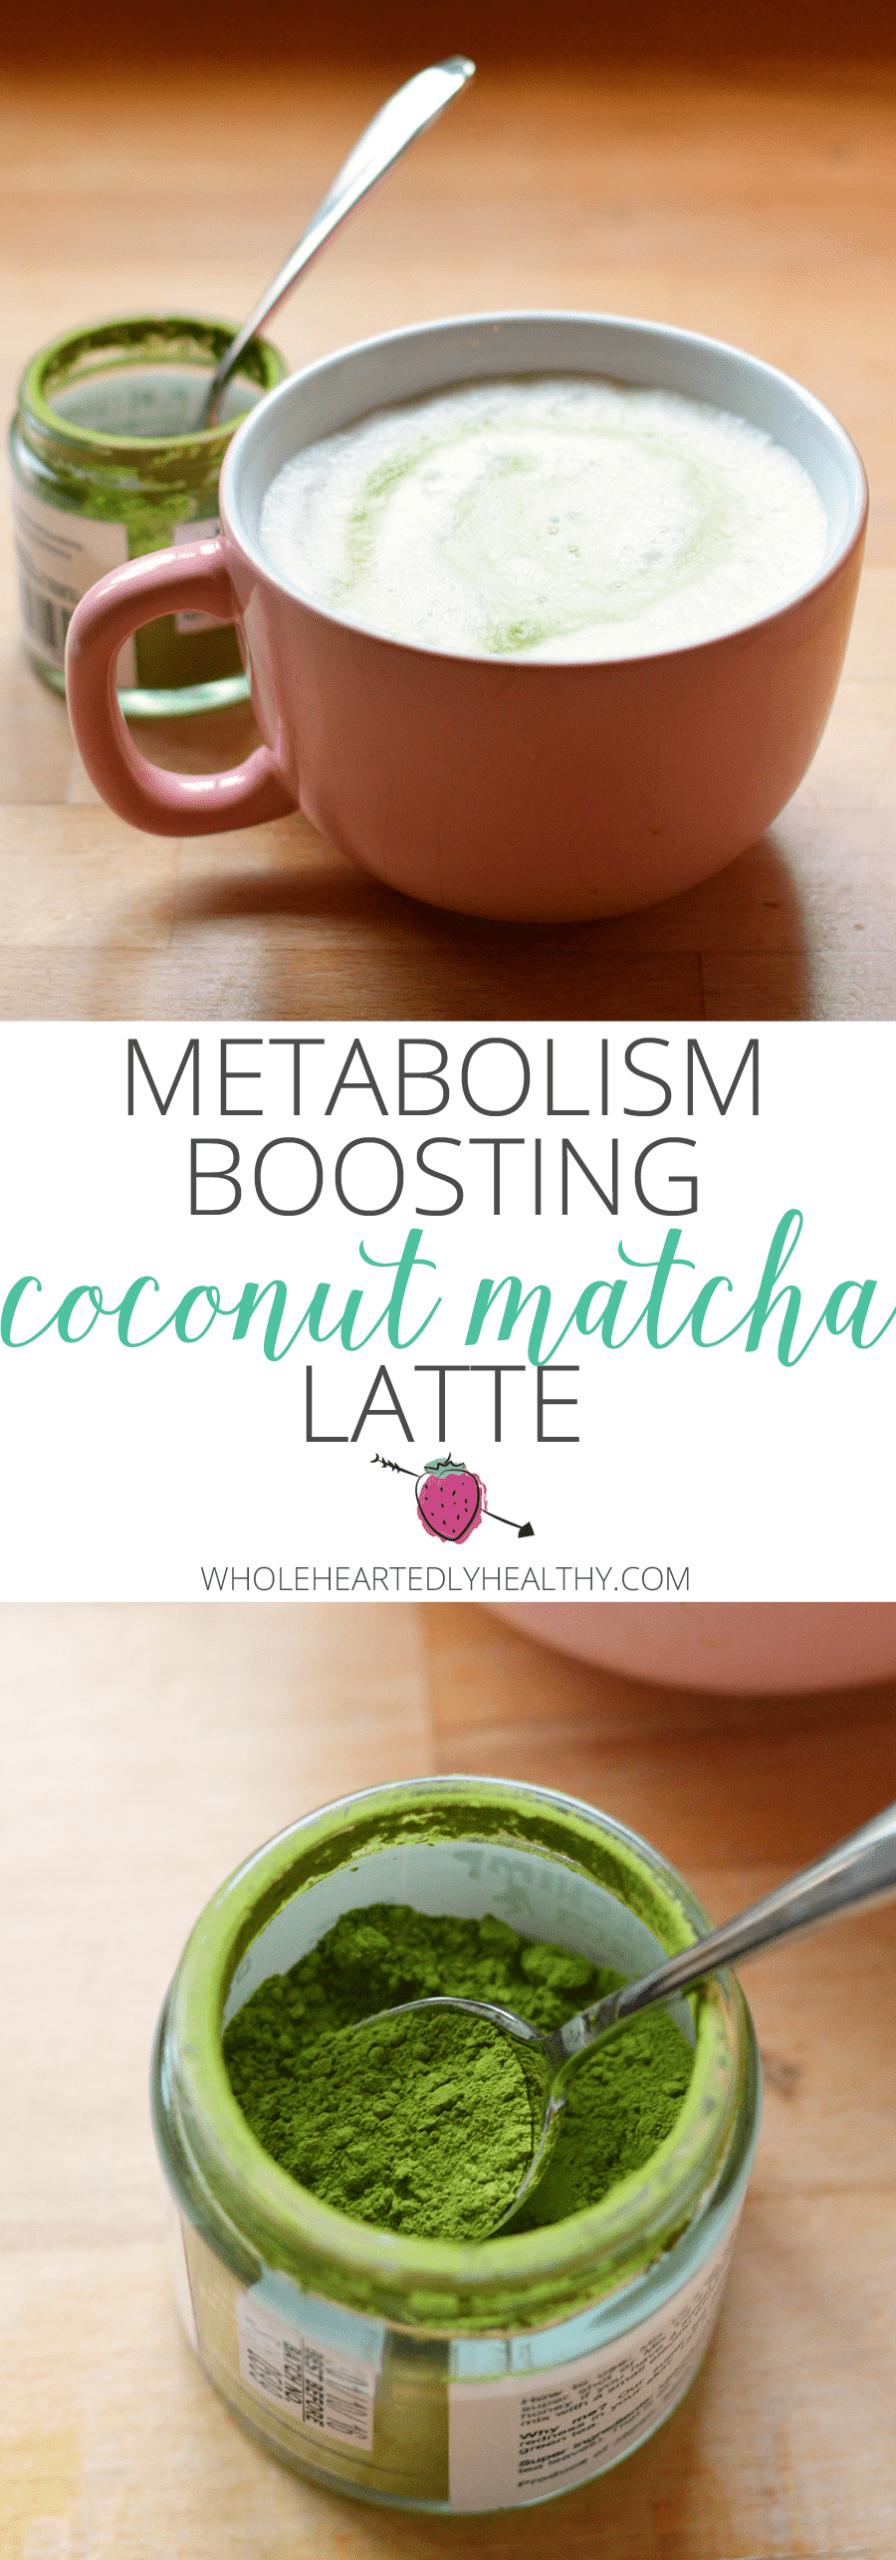 Coconut matcha latte recipe